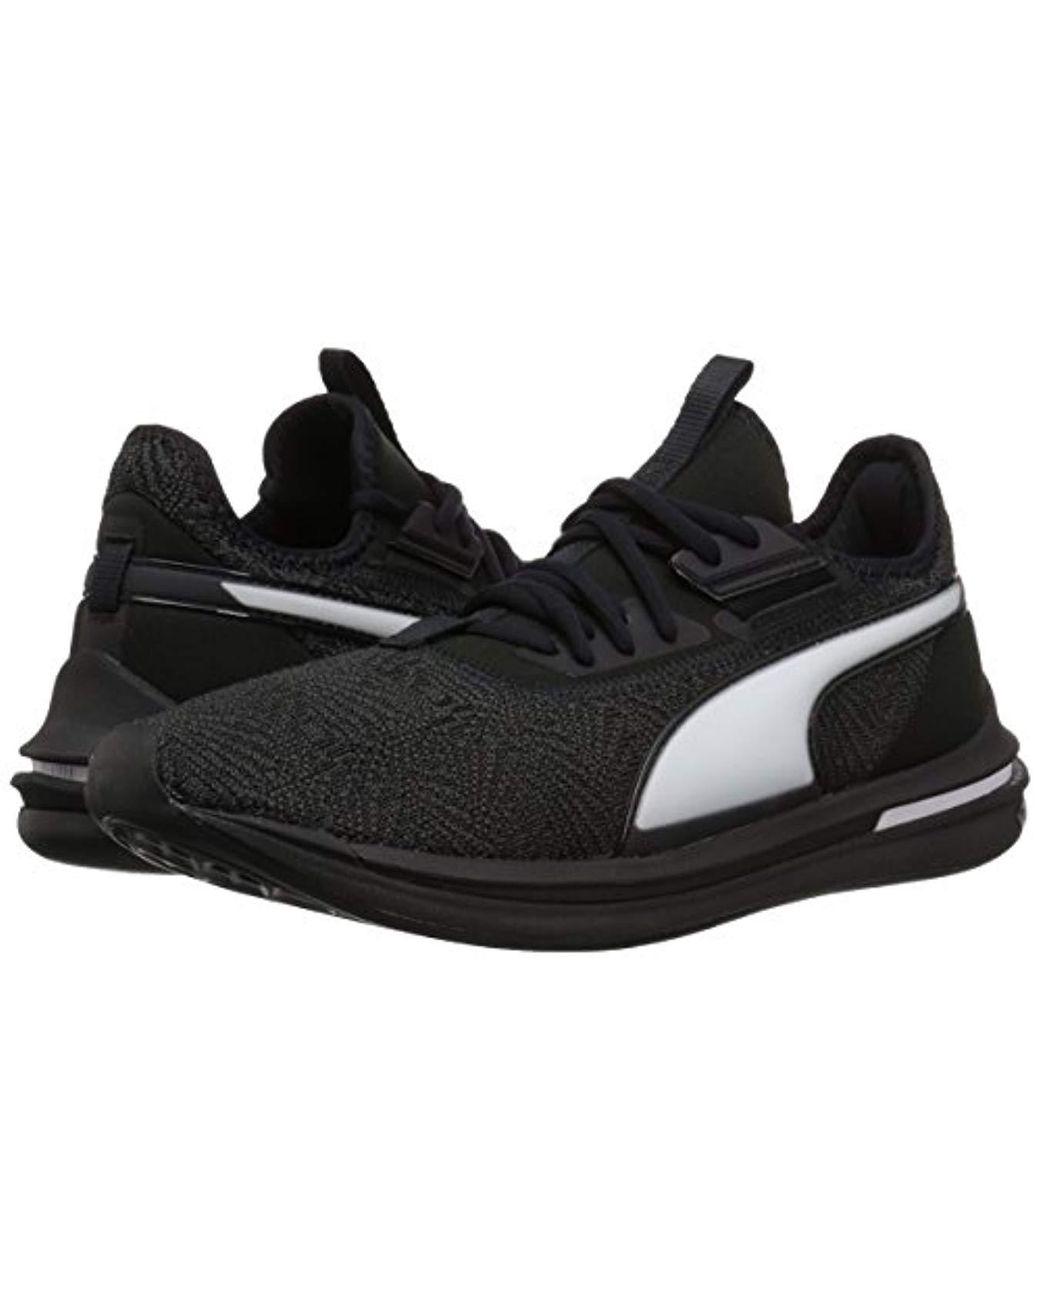 100% authentic 5ccc9 38e22 Men's Black Ignite Limitless Sr-71 Sneaker